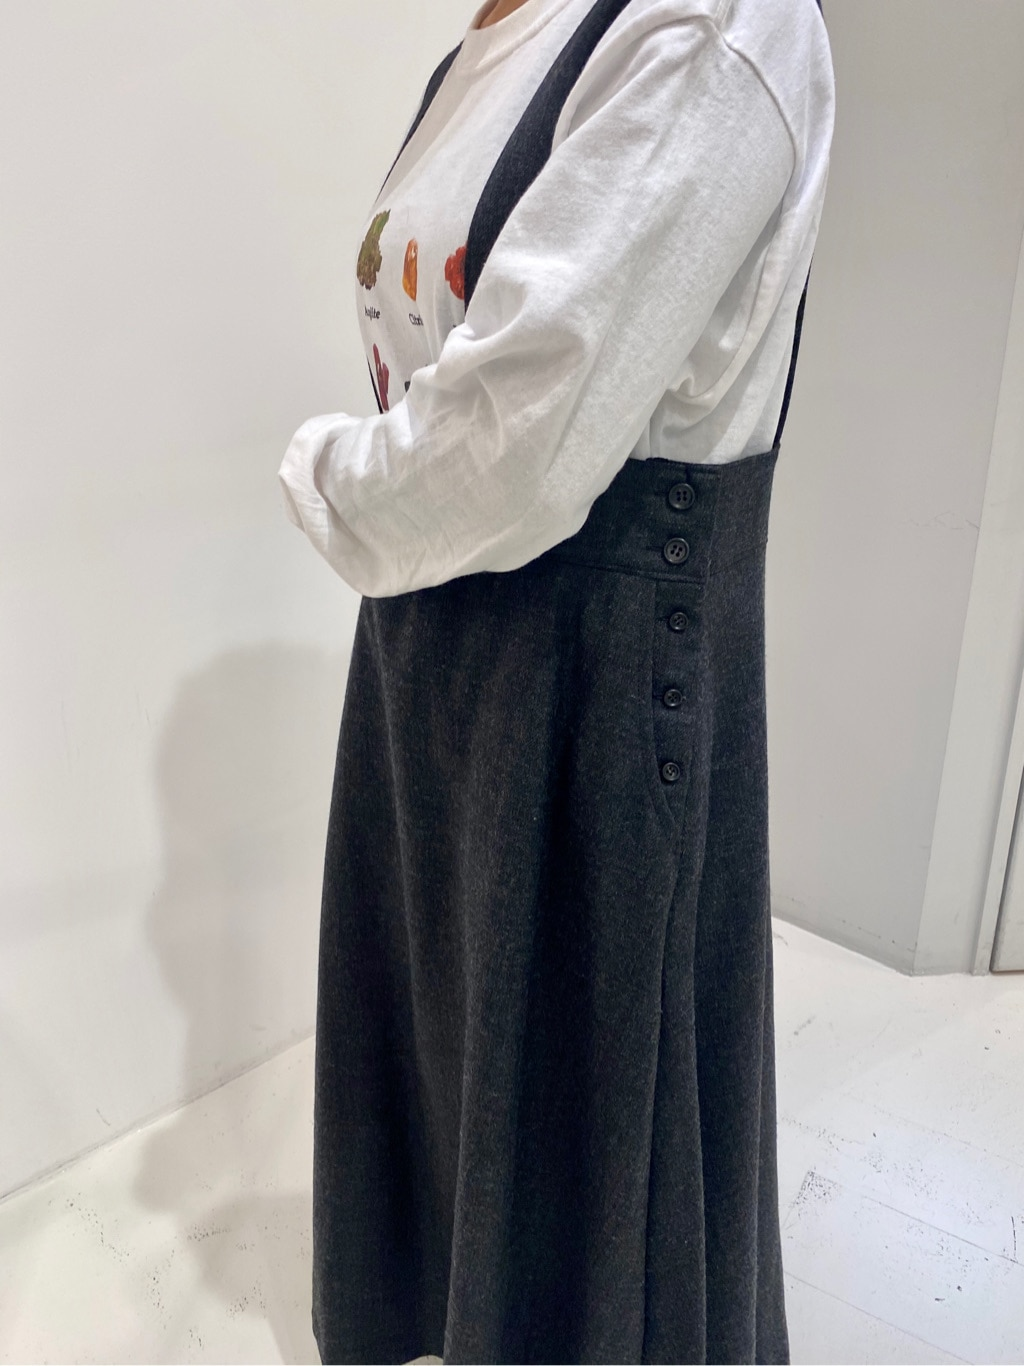 bulle de savon なんばシティ 身長:148cm 2020.11.26